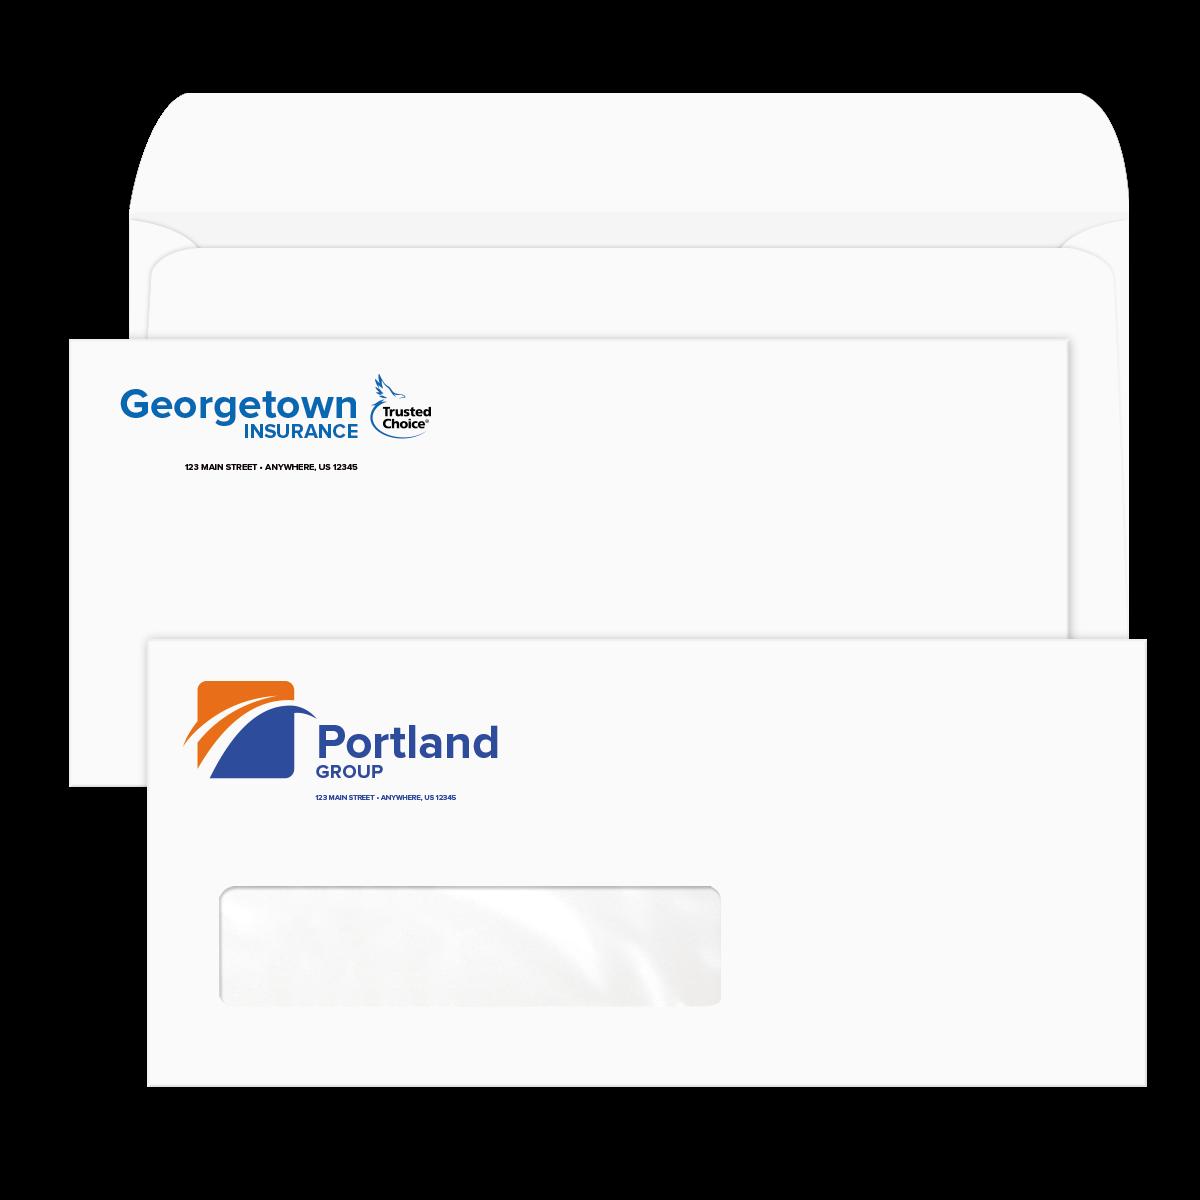 envelope clipart sample addressed